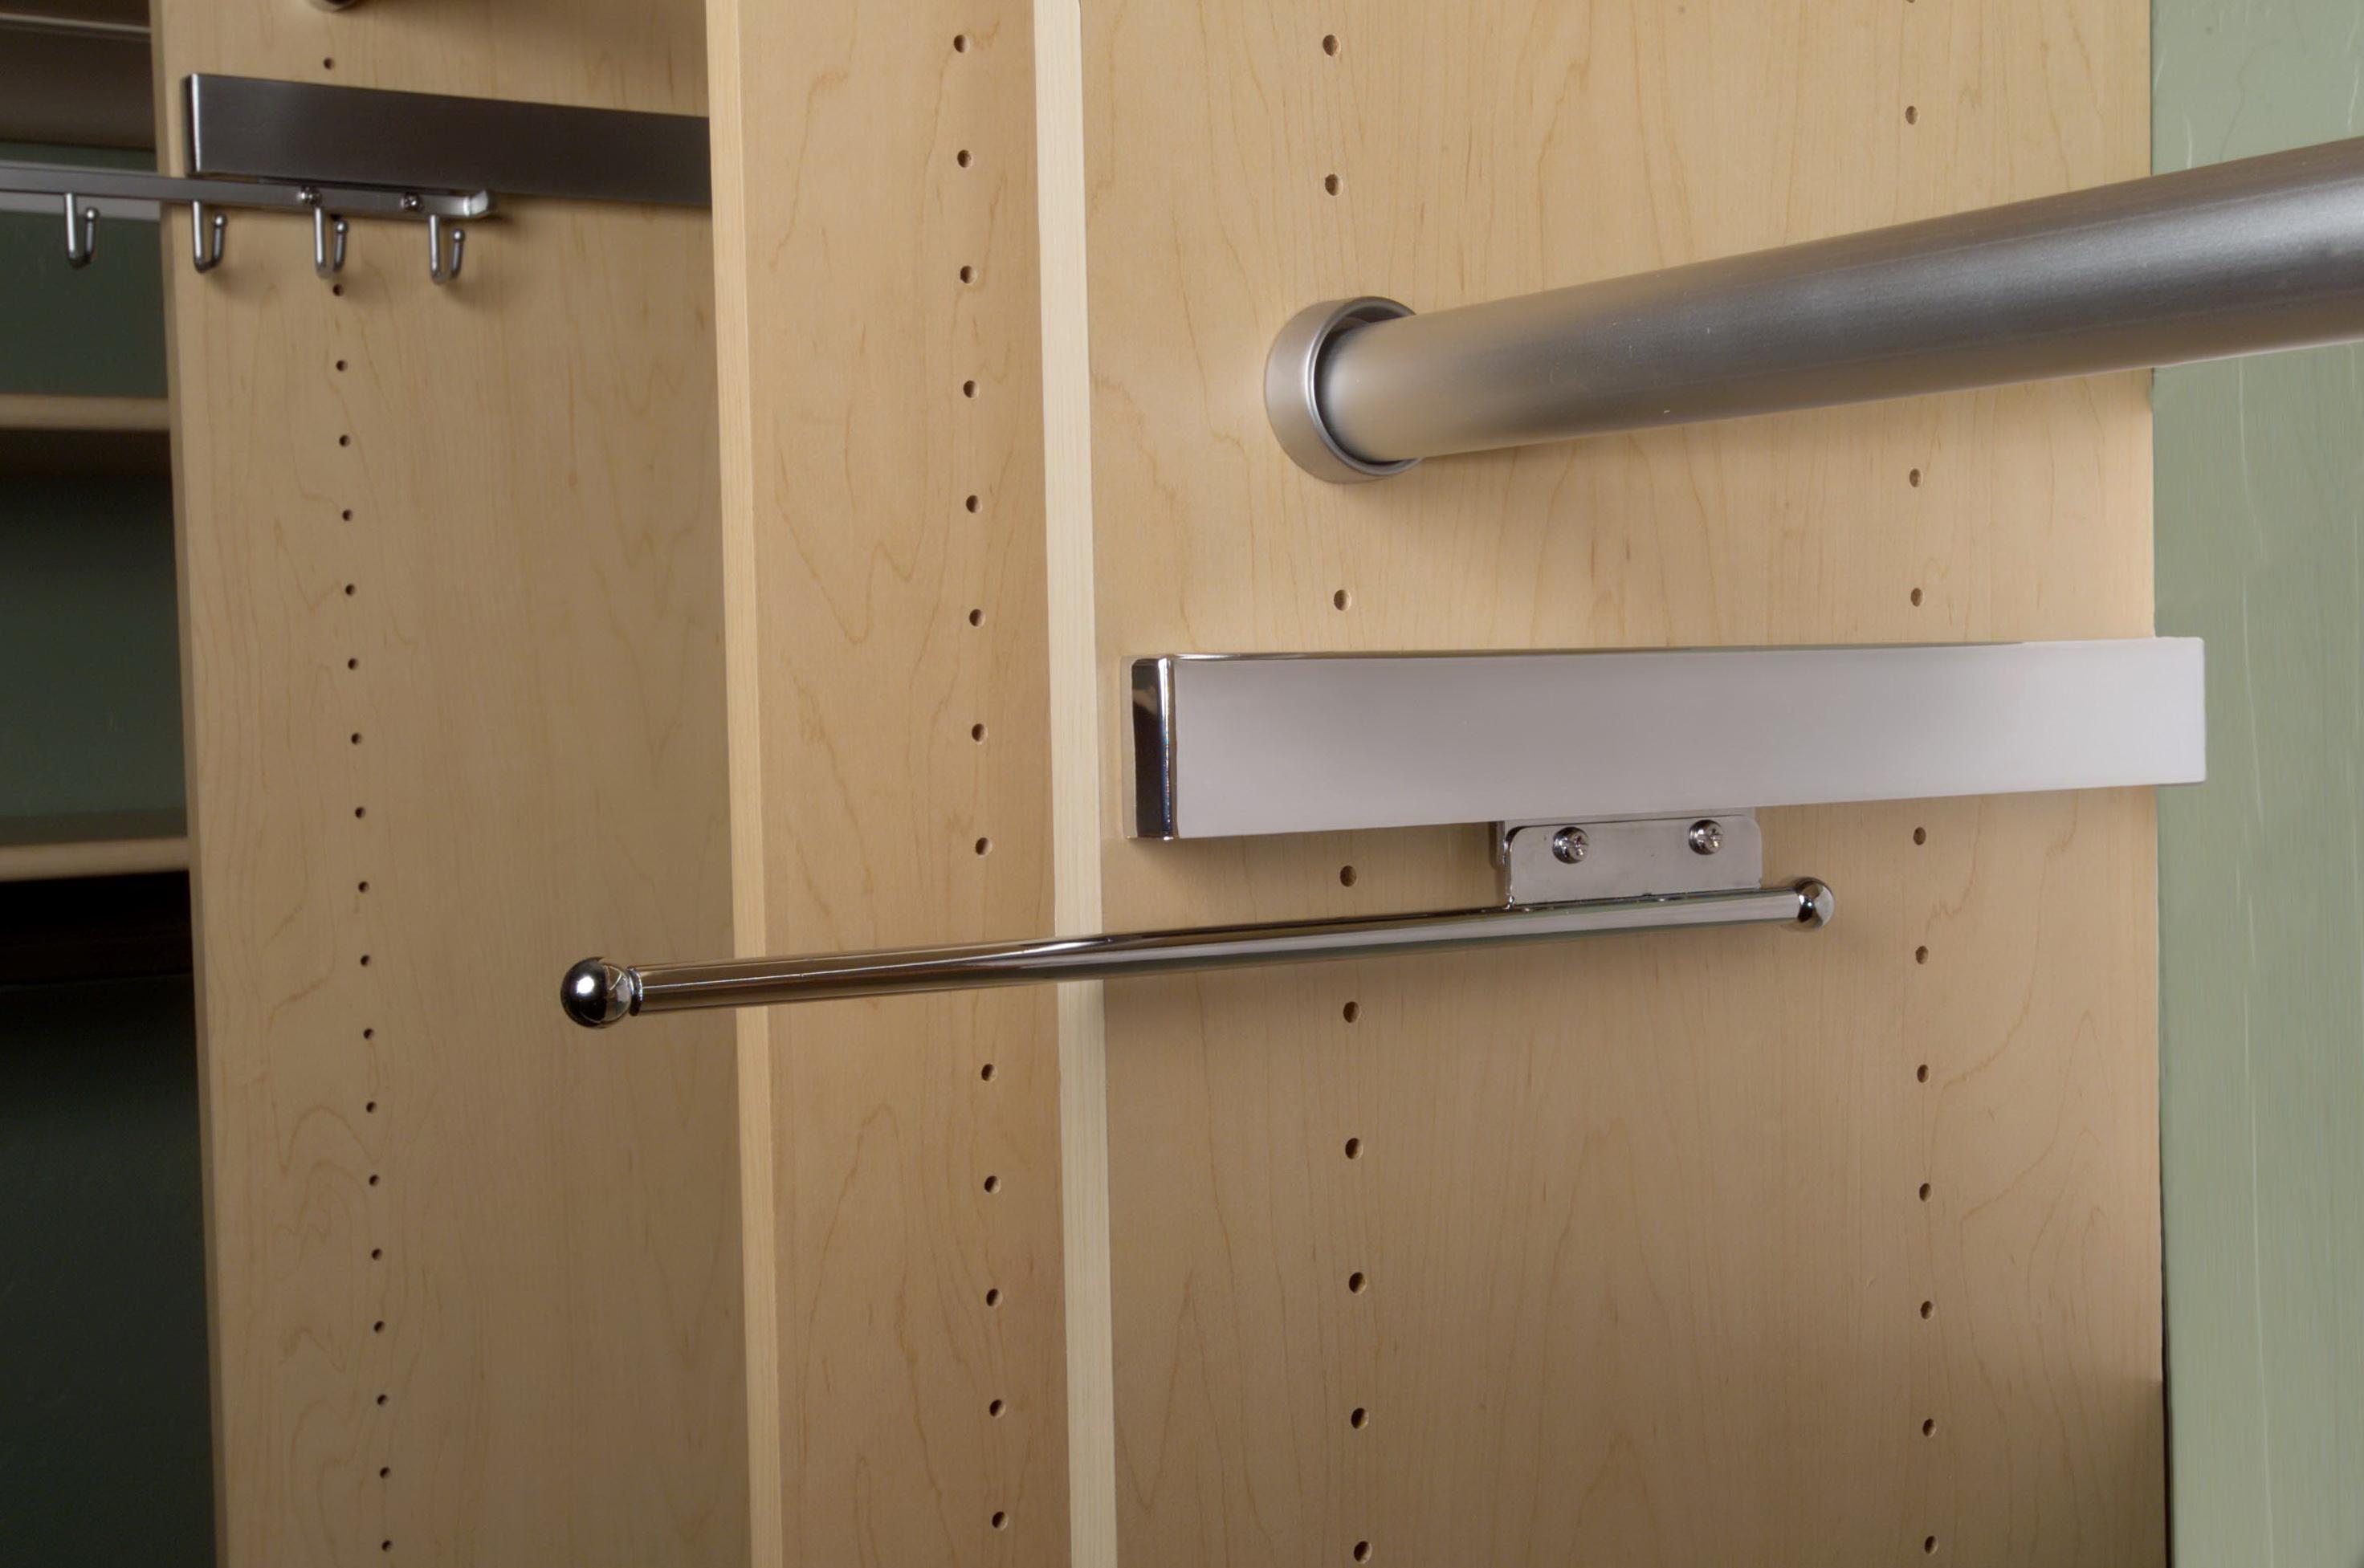 Telescopic Closet Valet Rod